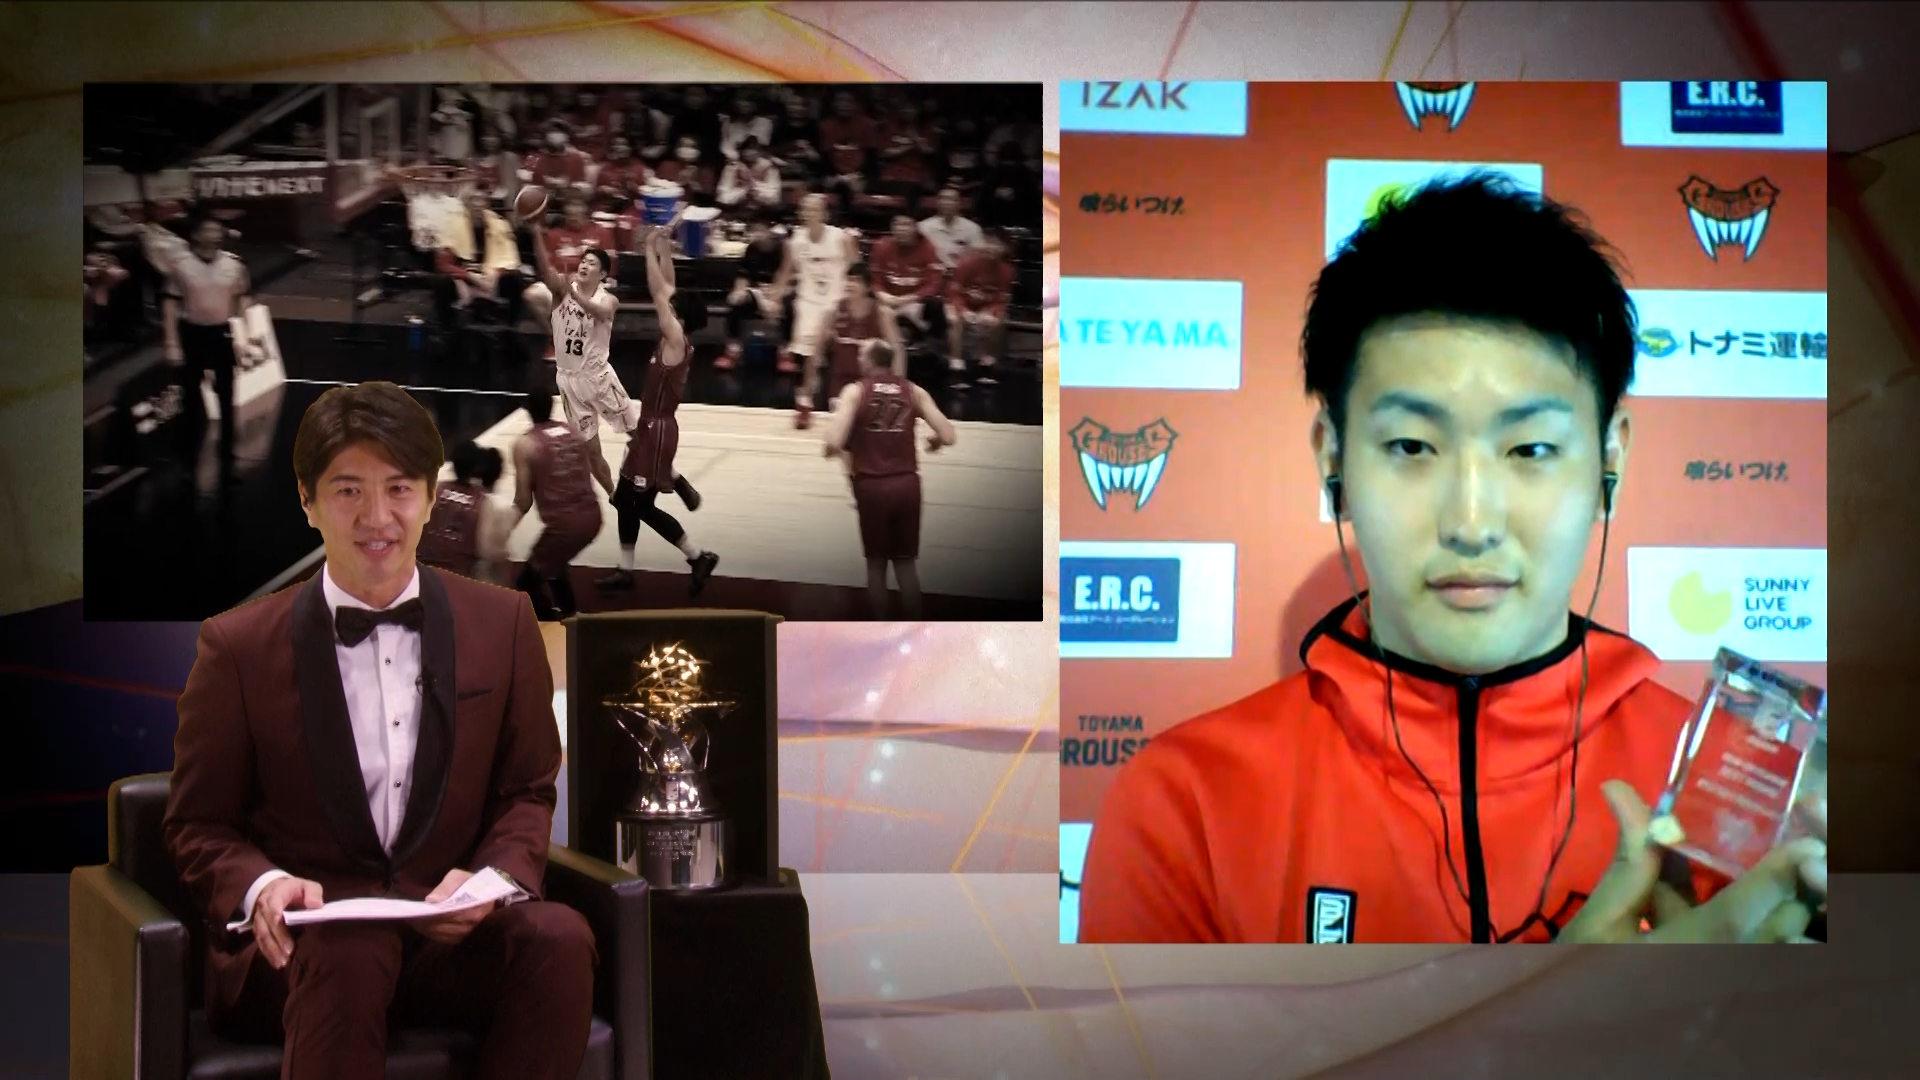 Bリーグ最優秀新人賞受賞の前田悟 琉球との対戦を語る